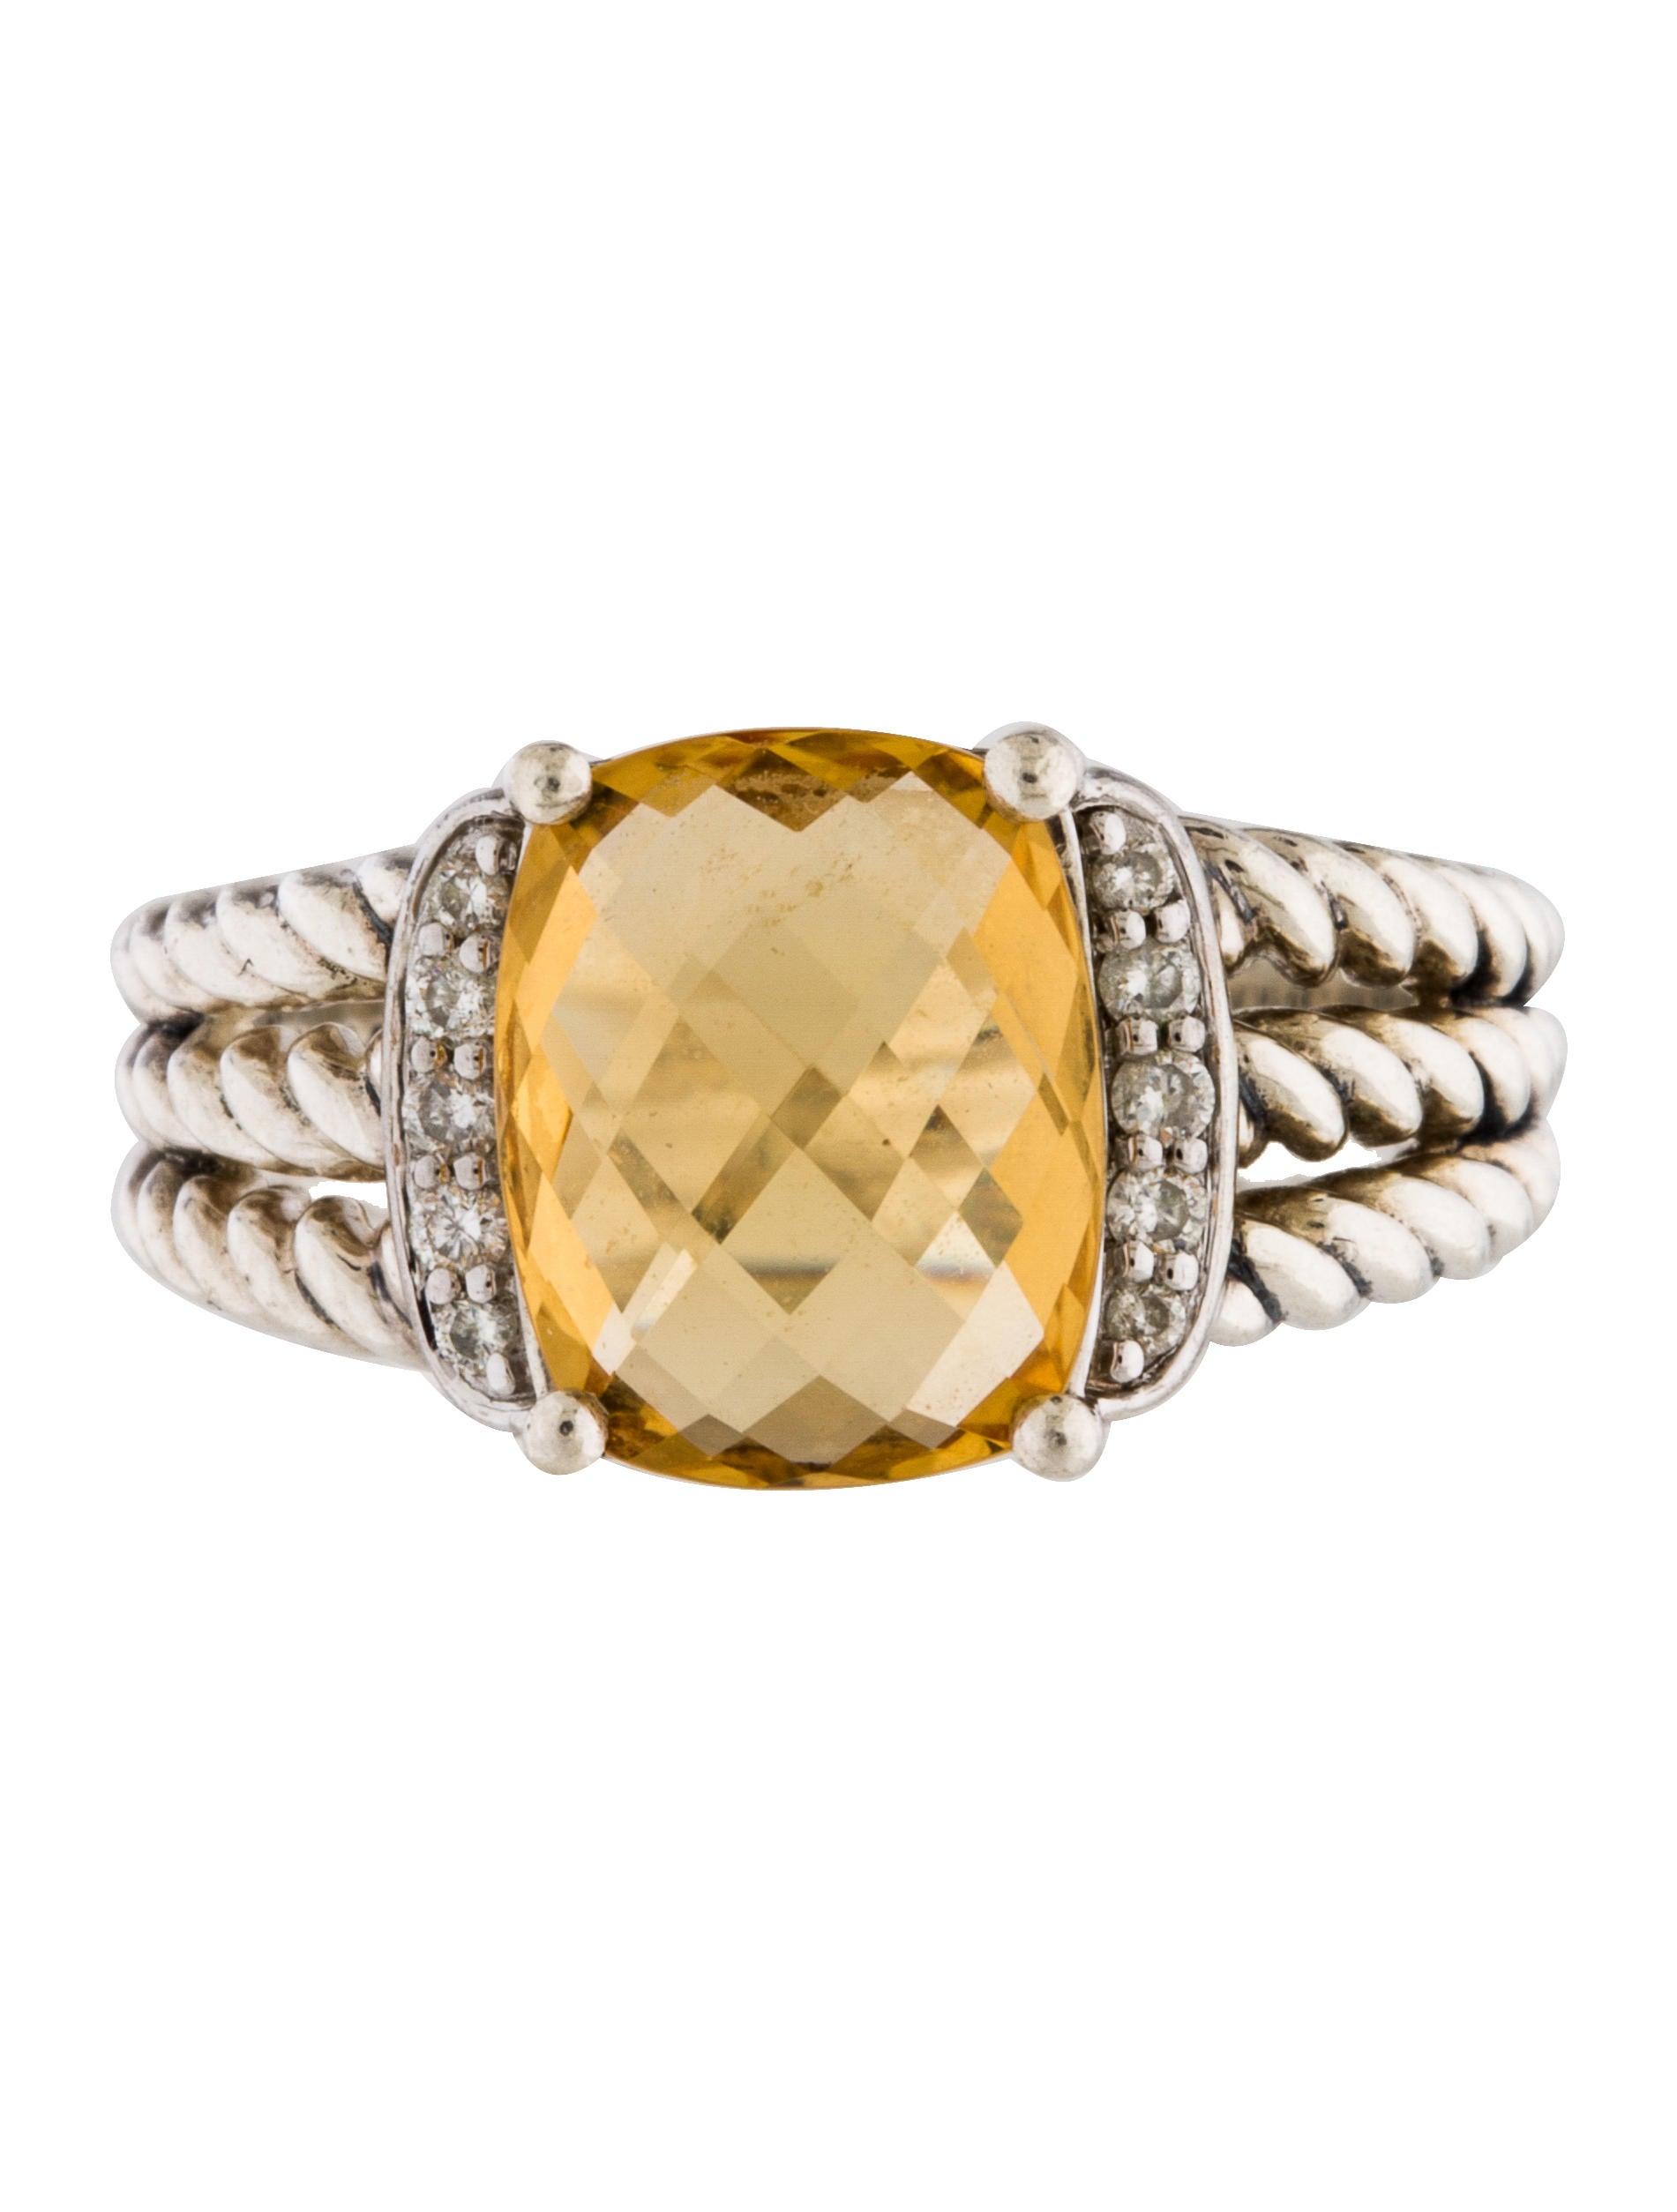 David yurman diamond citrine petite wheaton ring rings for David yurman inspired jewelry rings